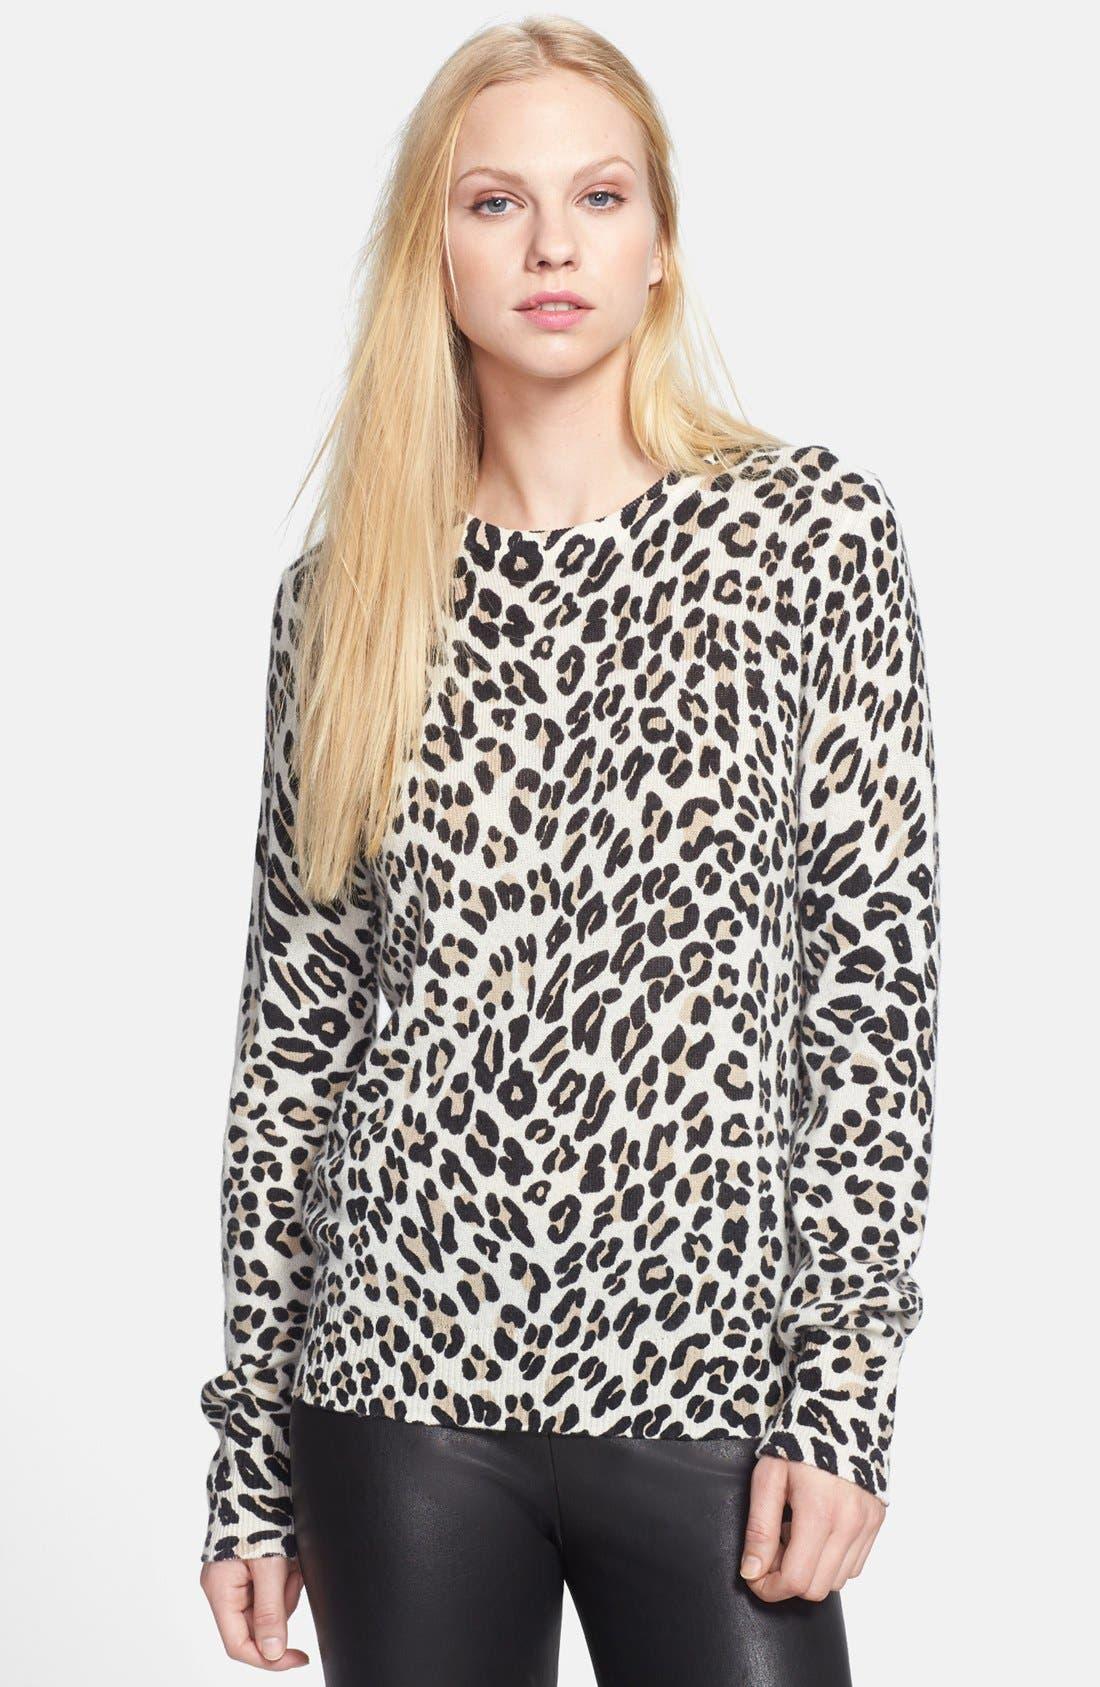 Alternate Image 1 Selected - Equipment 'Shane' Leopard Spot Cashmere Sweater